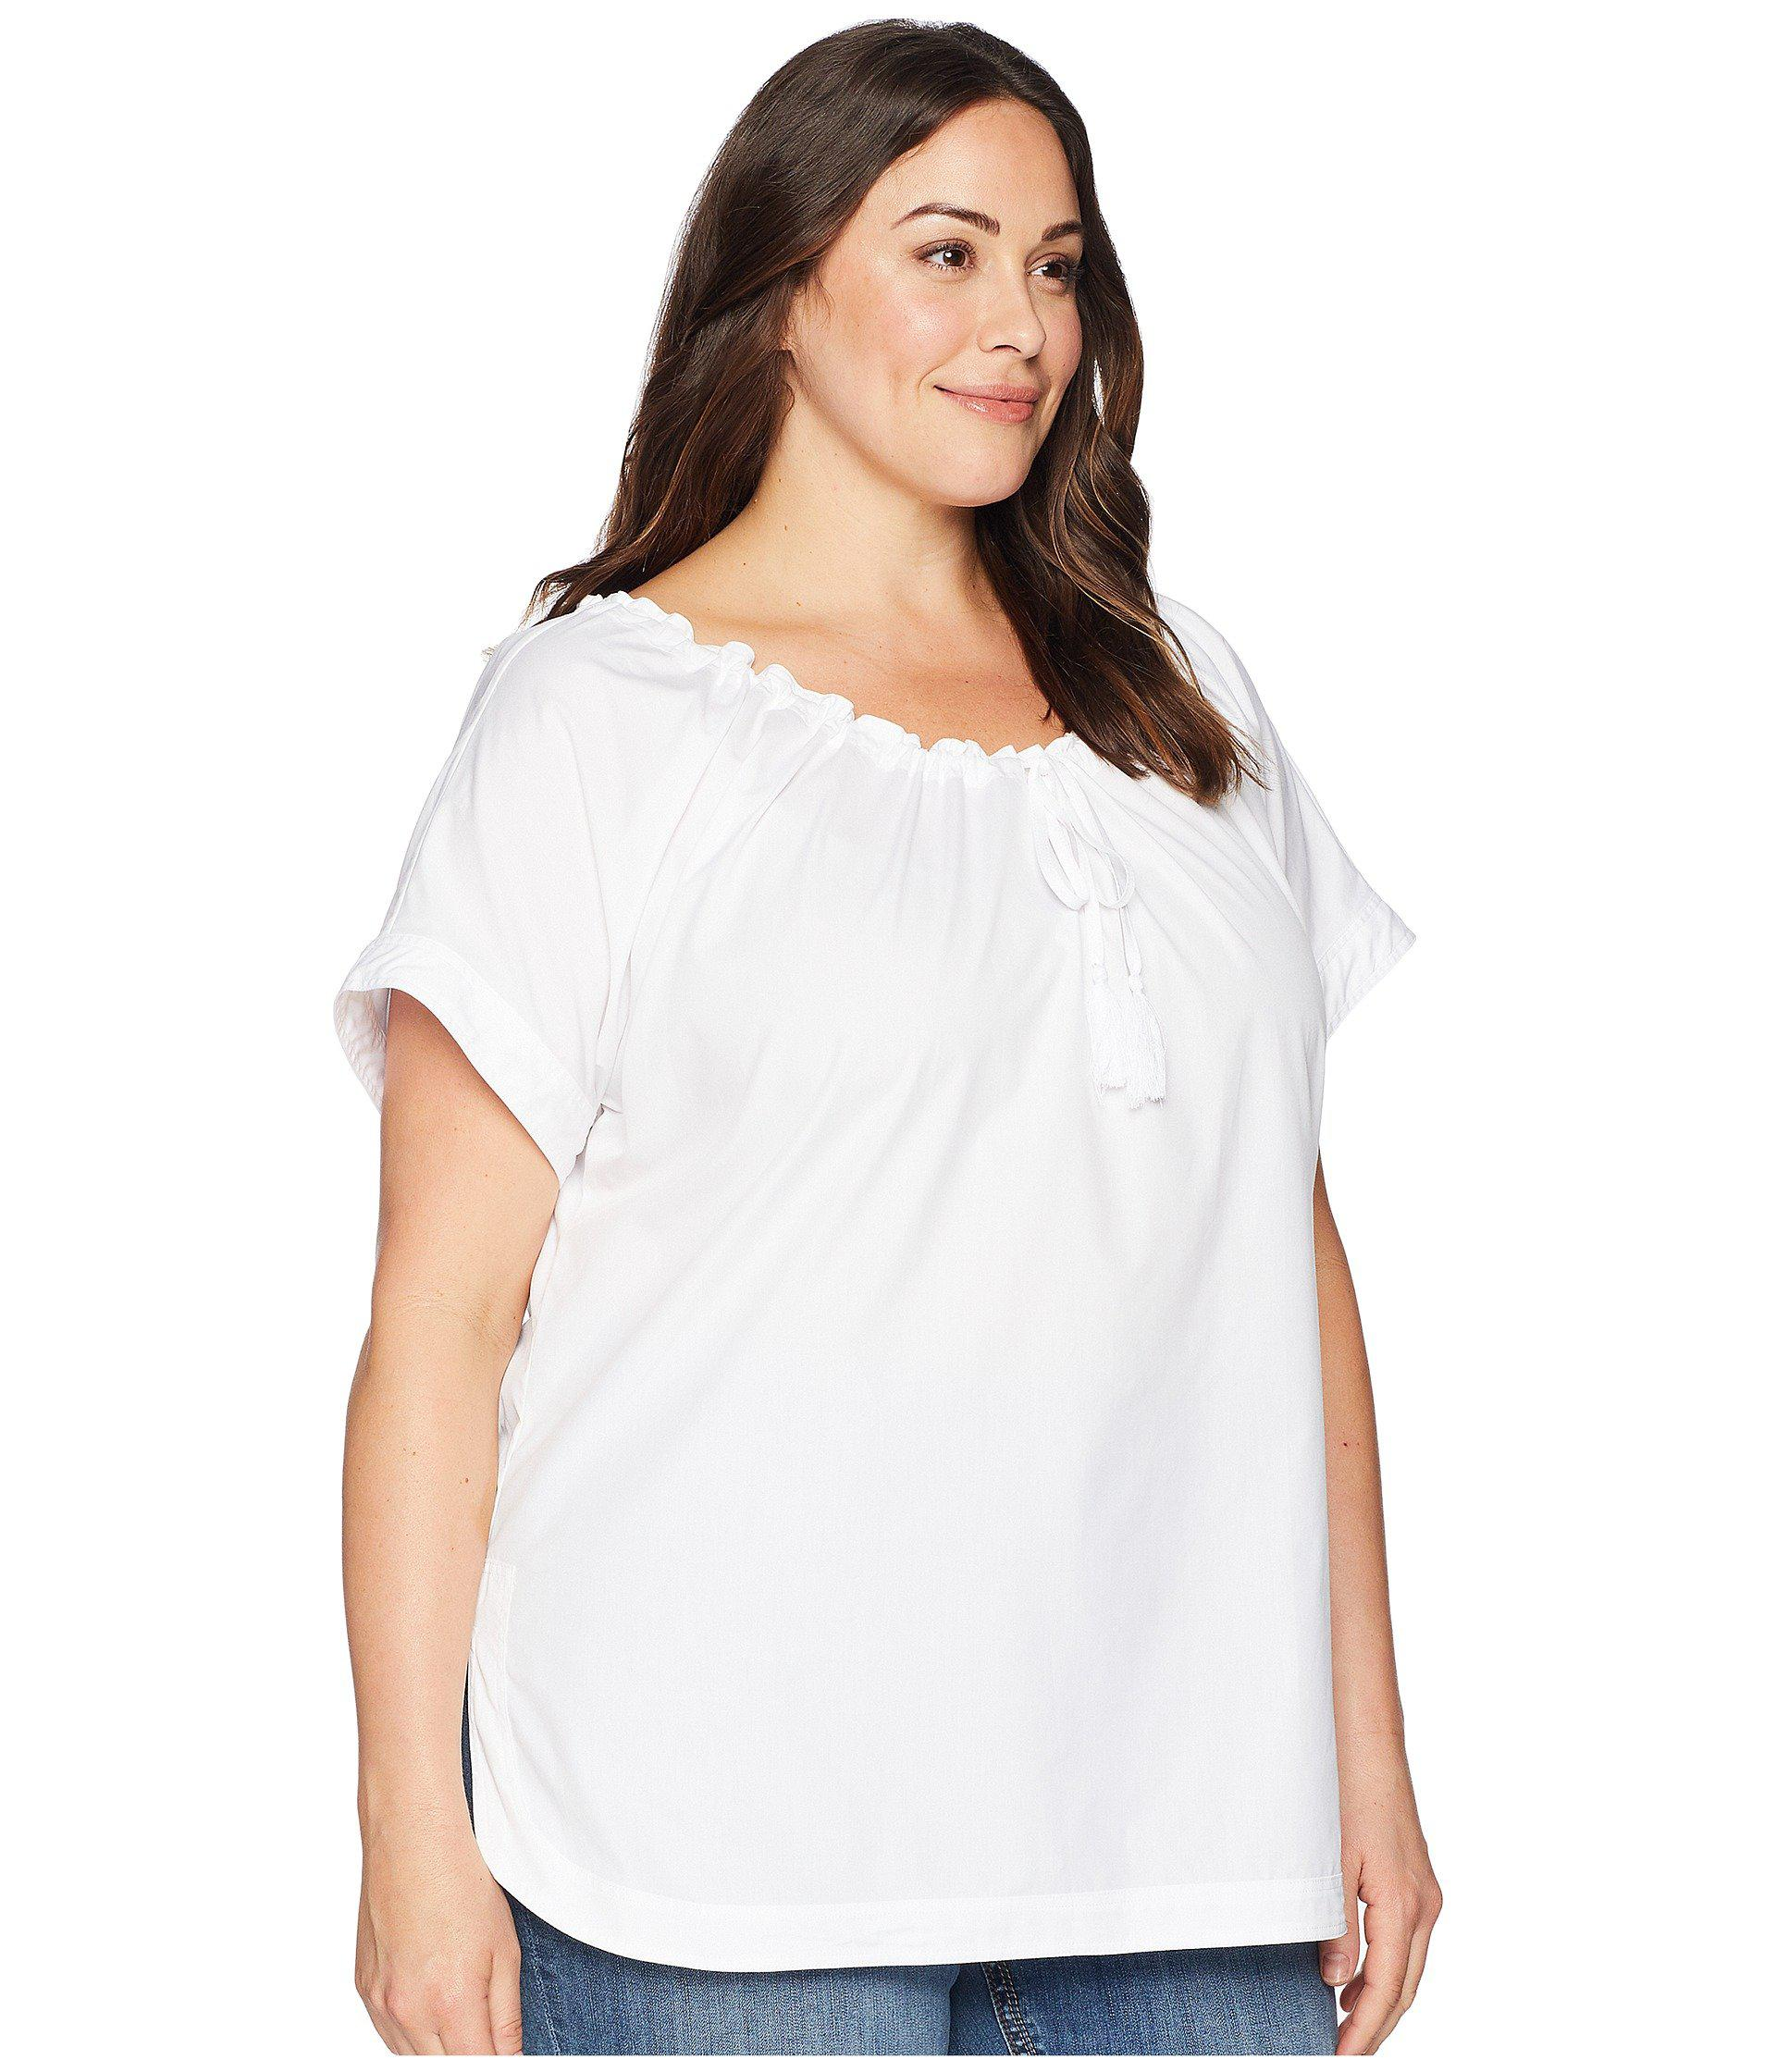 ab363a3c5fc Lauren by Ralph Lauren - White Plus Size 80s Cotton Broadcloth Short Sleeve  Shirt - Lyst. View fullscreen